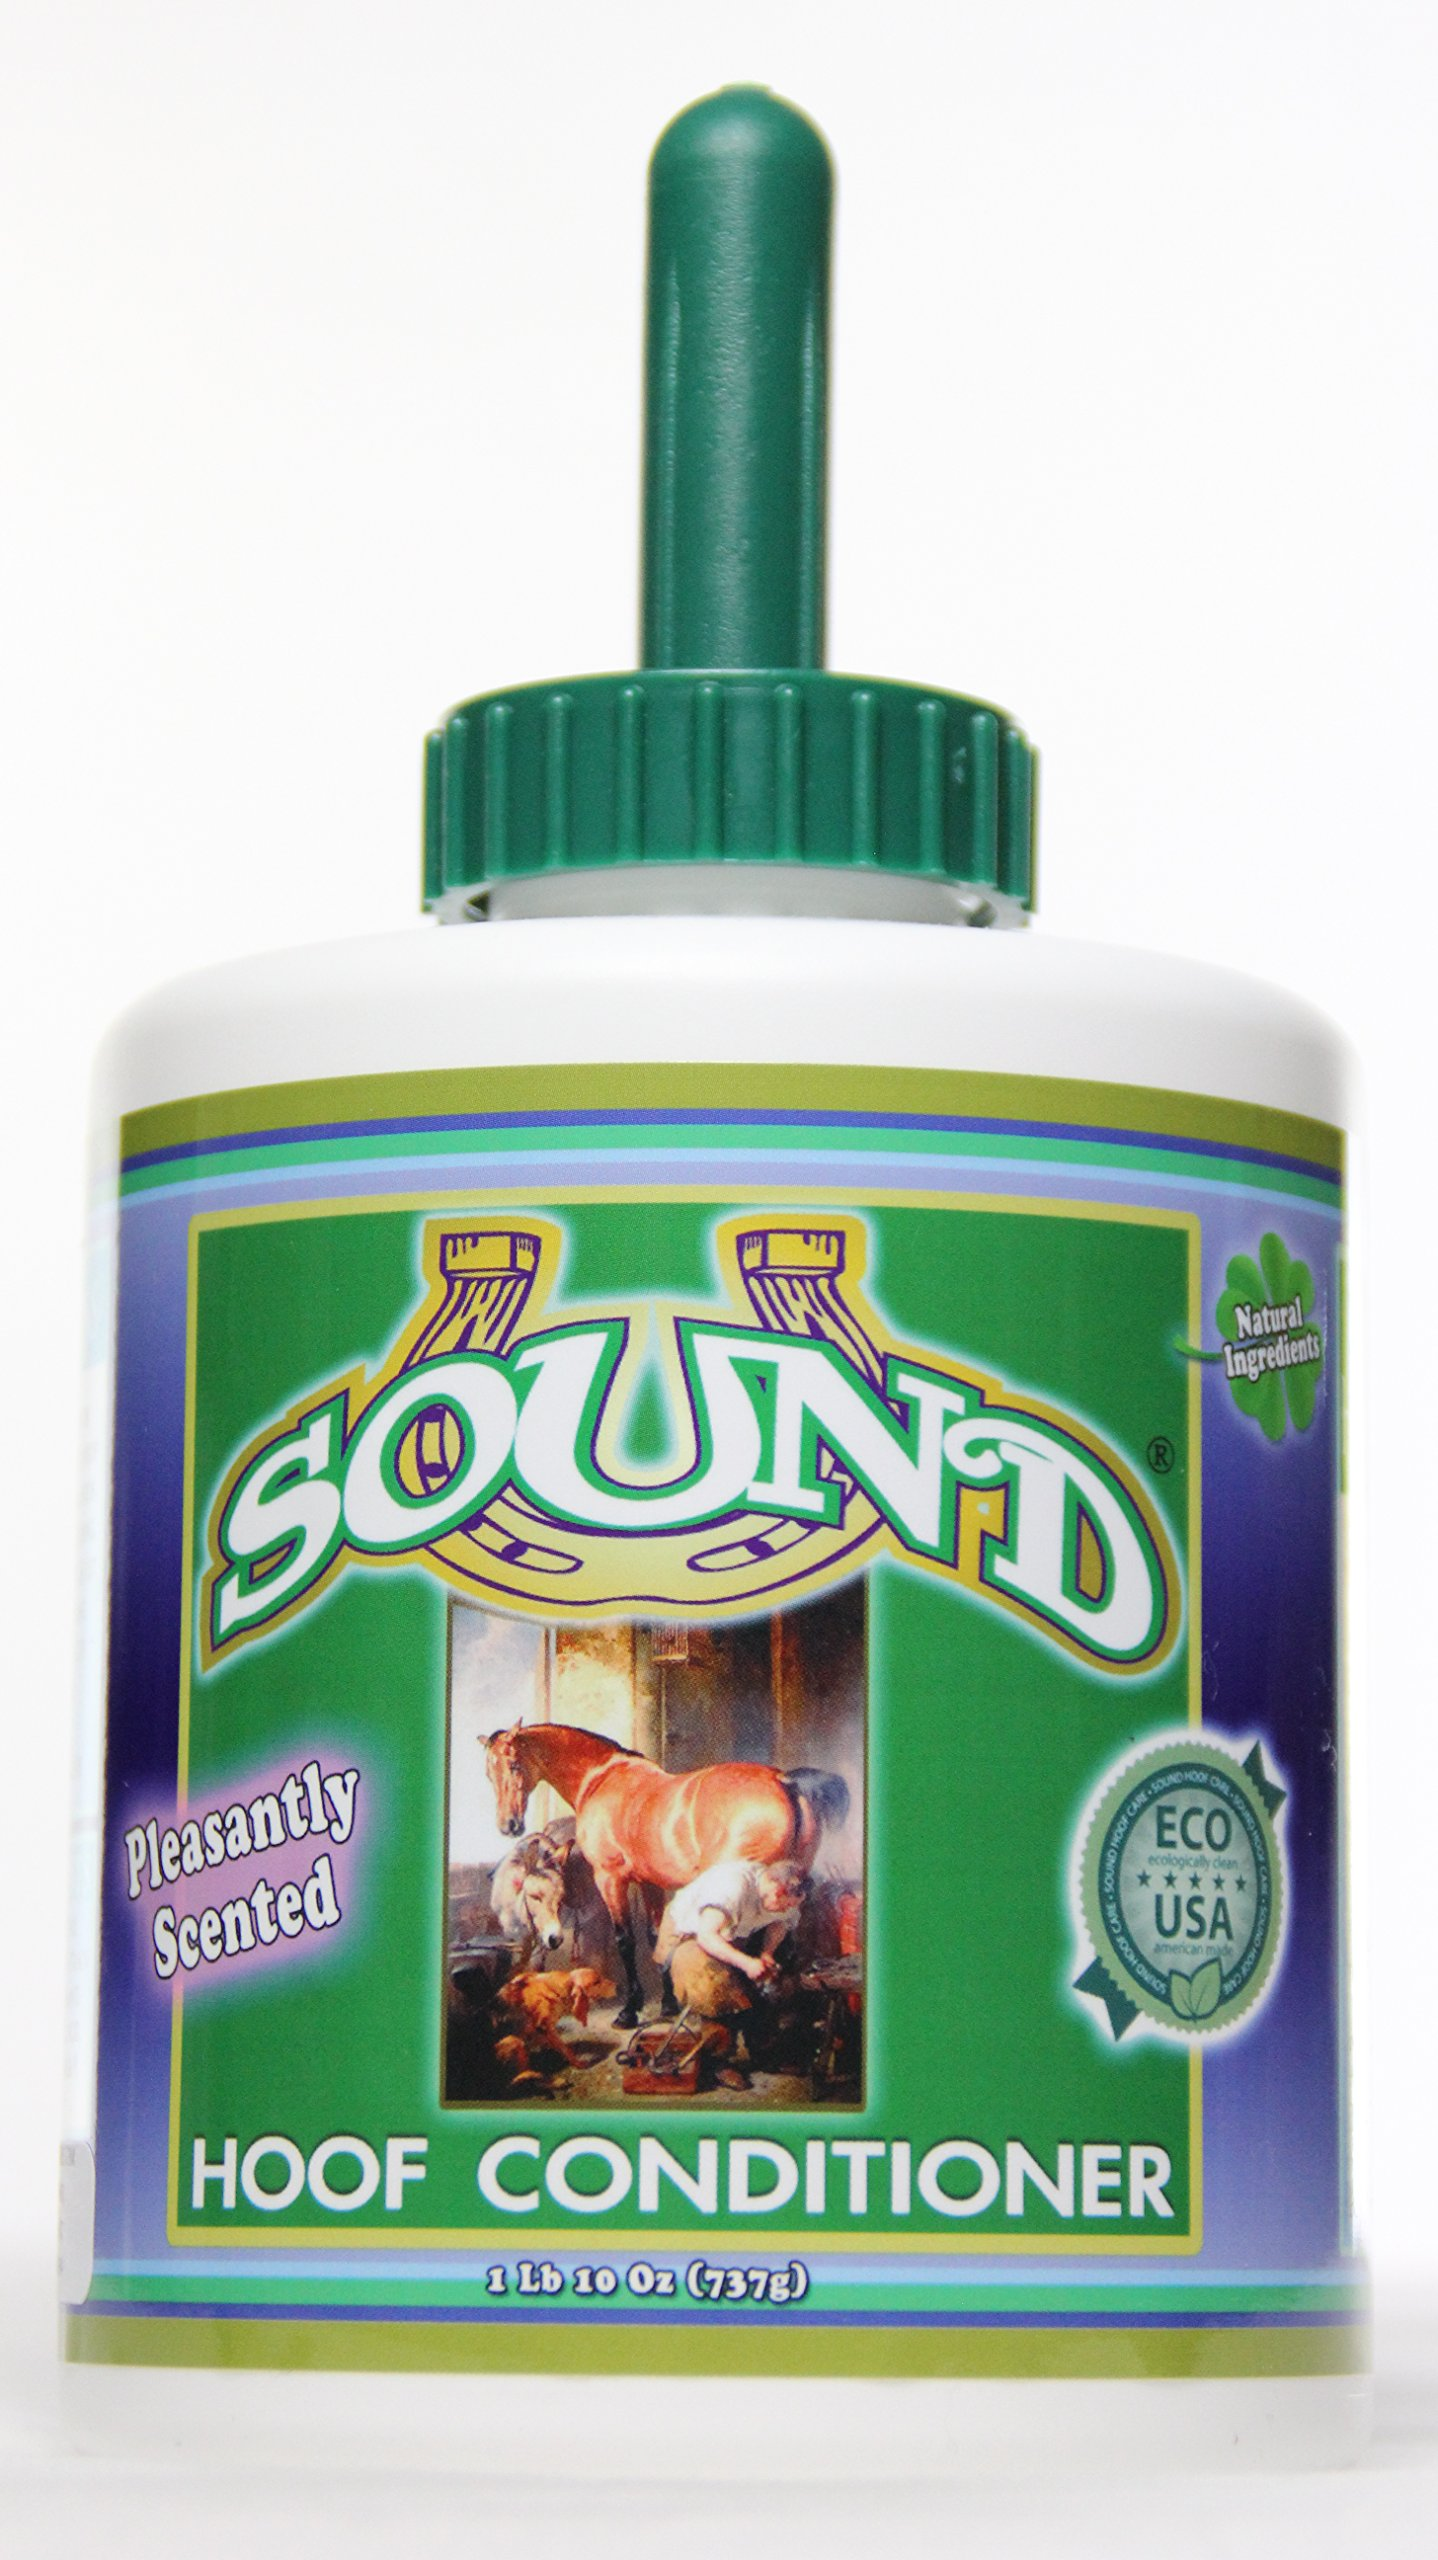 SOUND Hoof Conditioner | 1Lb 10oz